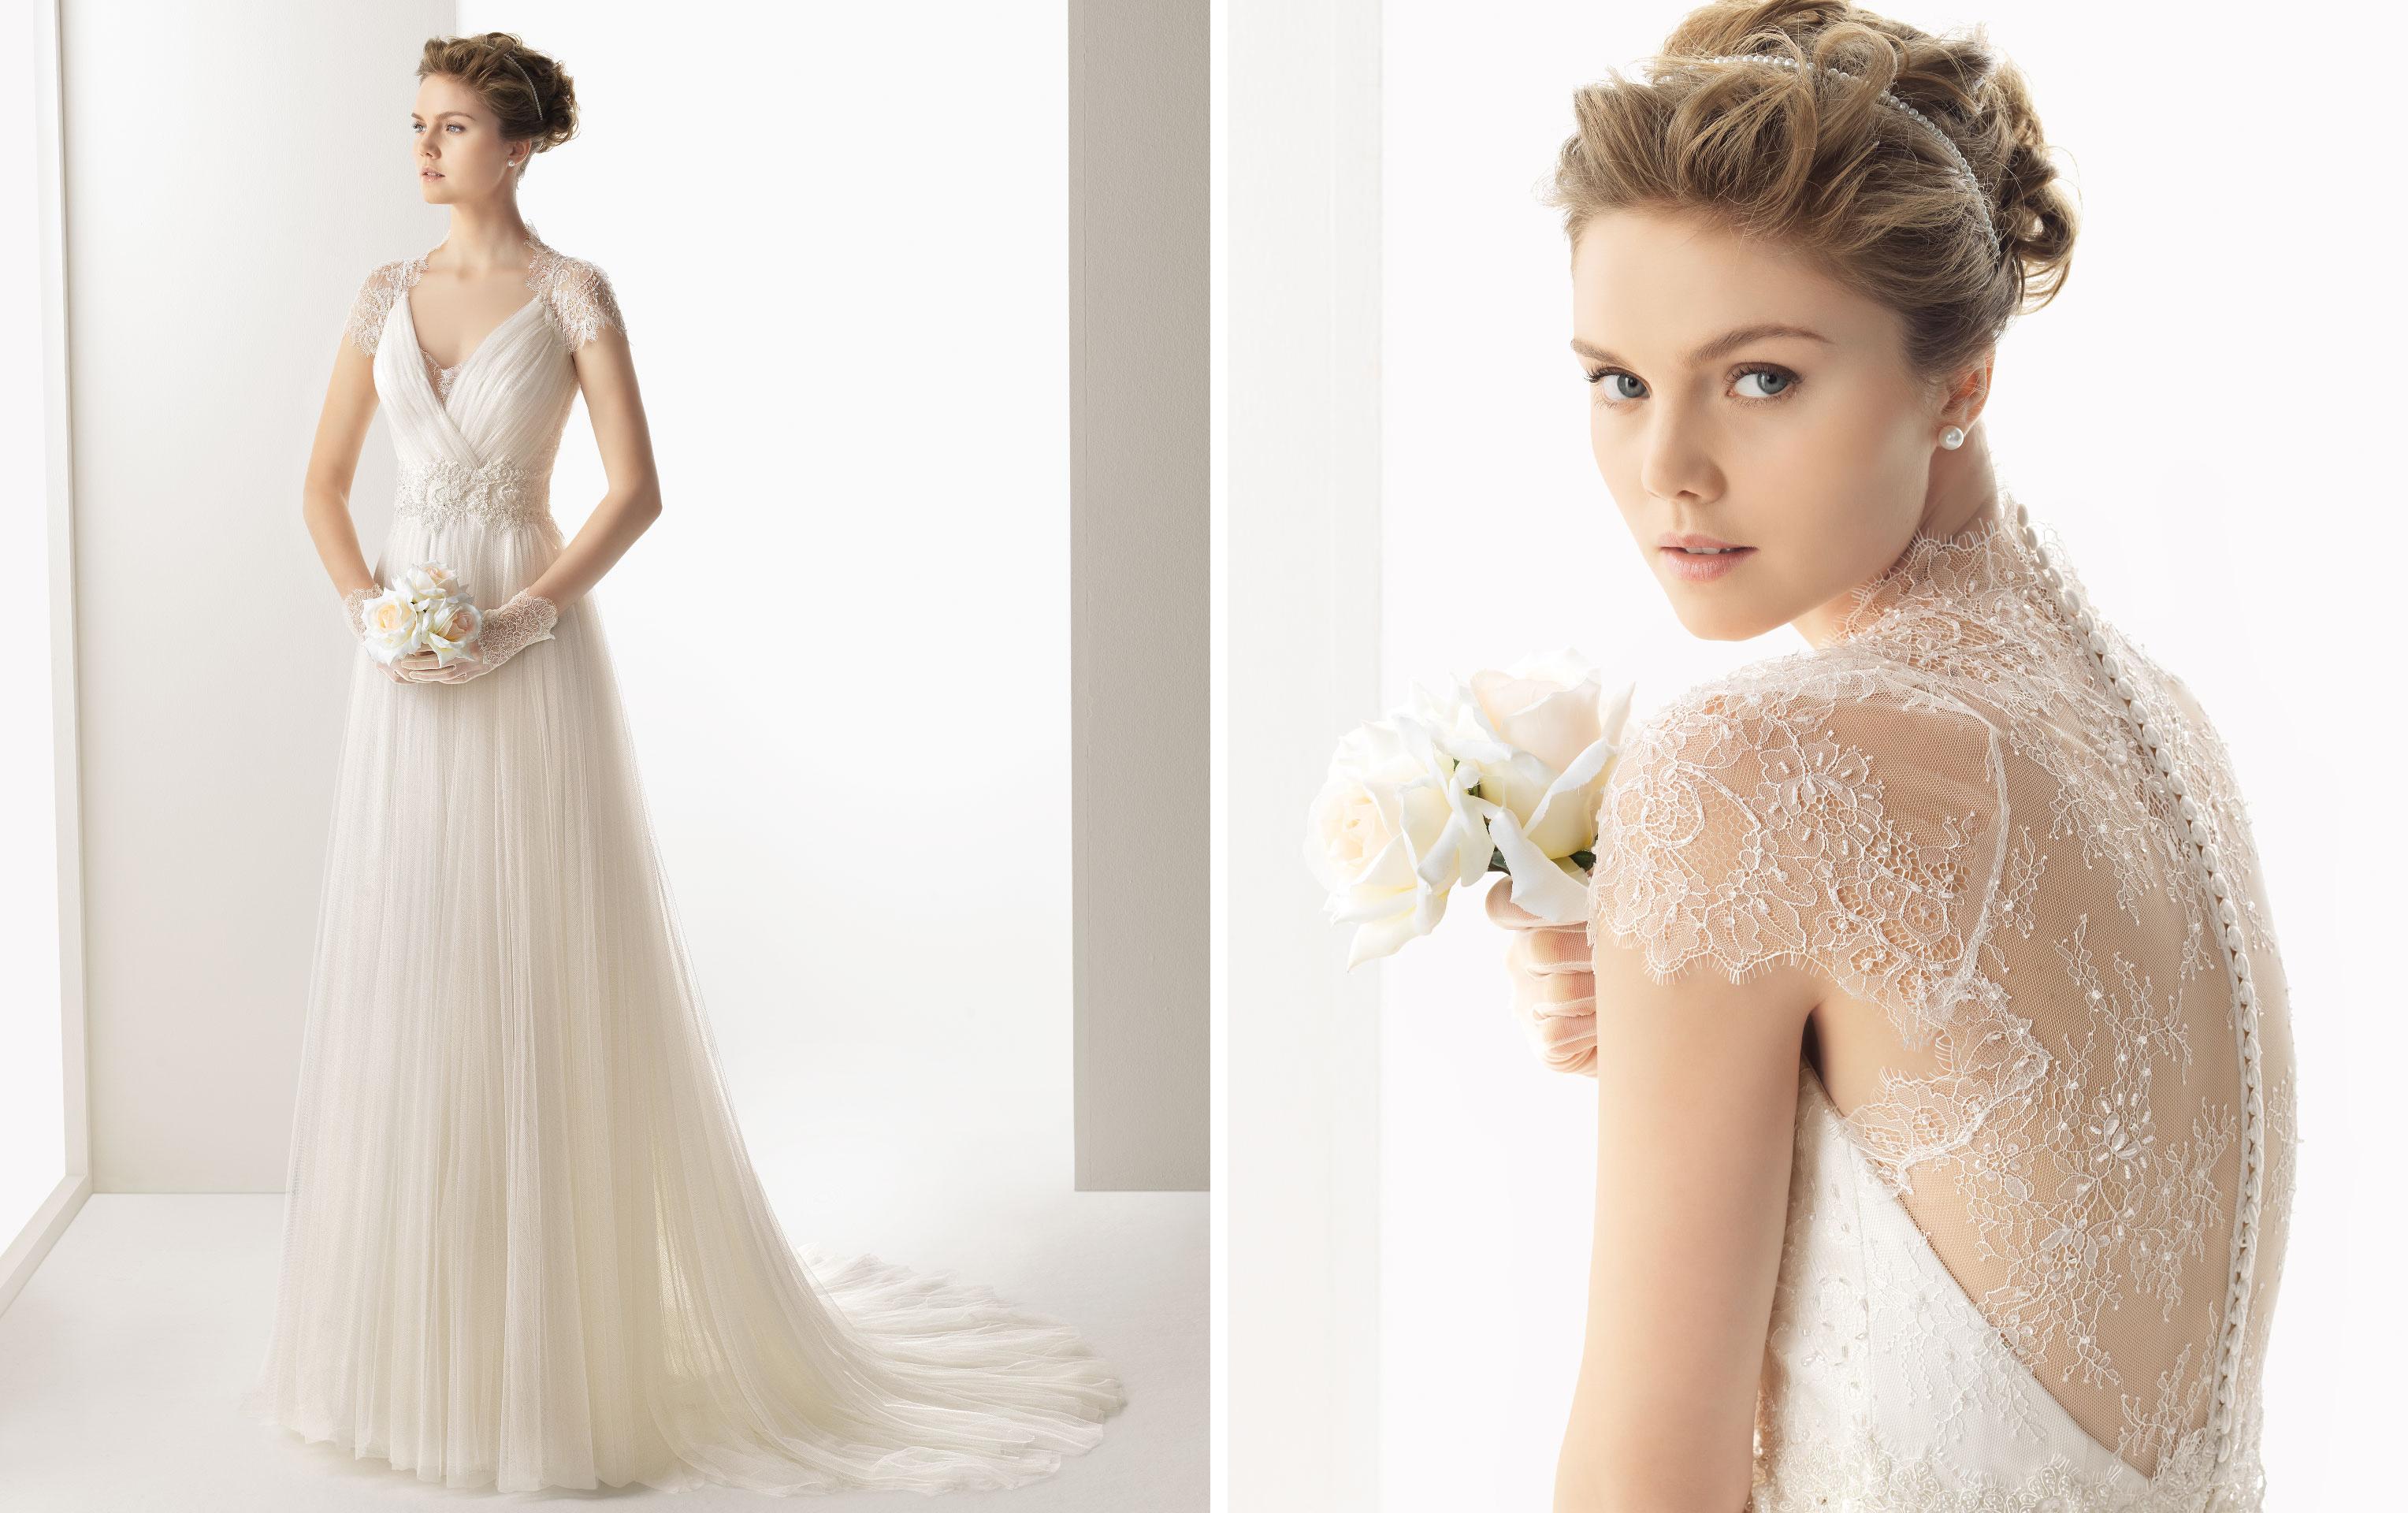 2014 wedding dresses from rosa clara soft bridal for Rosa clara wedding dresses 2014